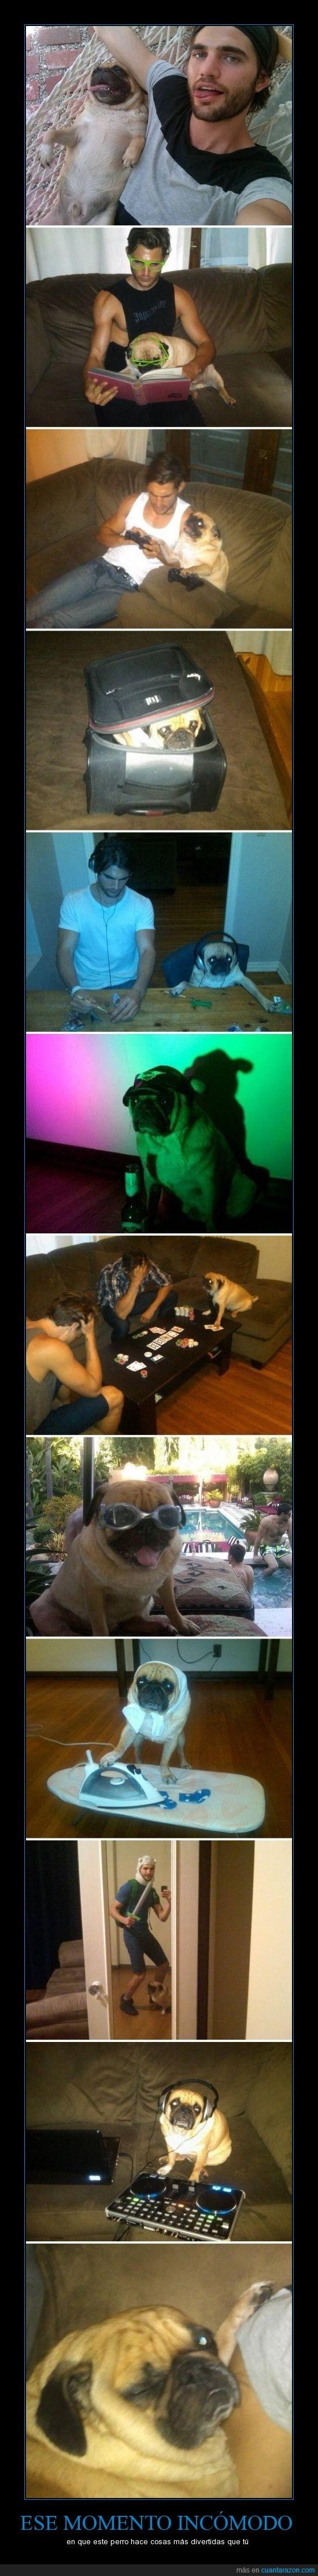 dj,fiesta,gafas,jugar,perro,poker,ps3